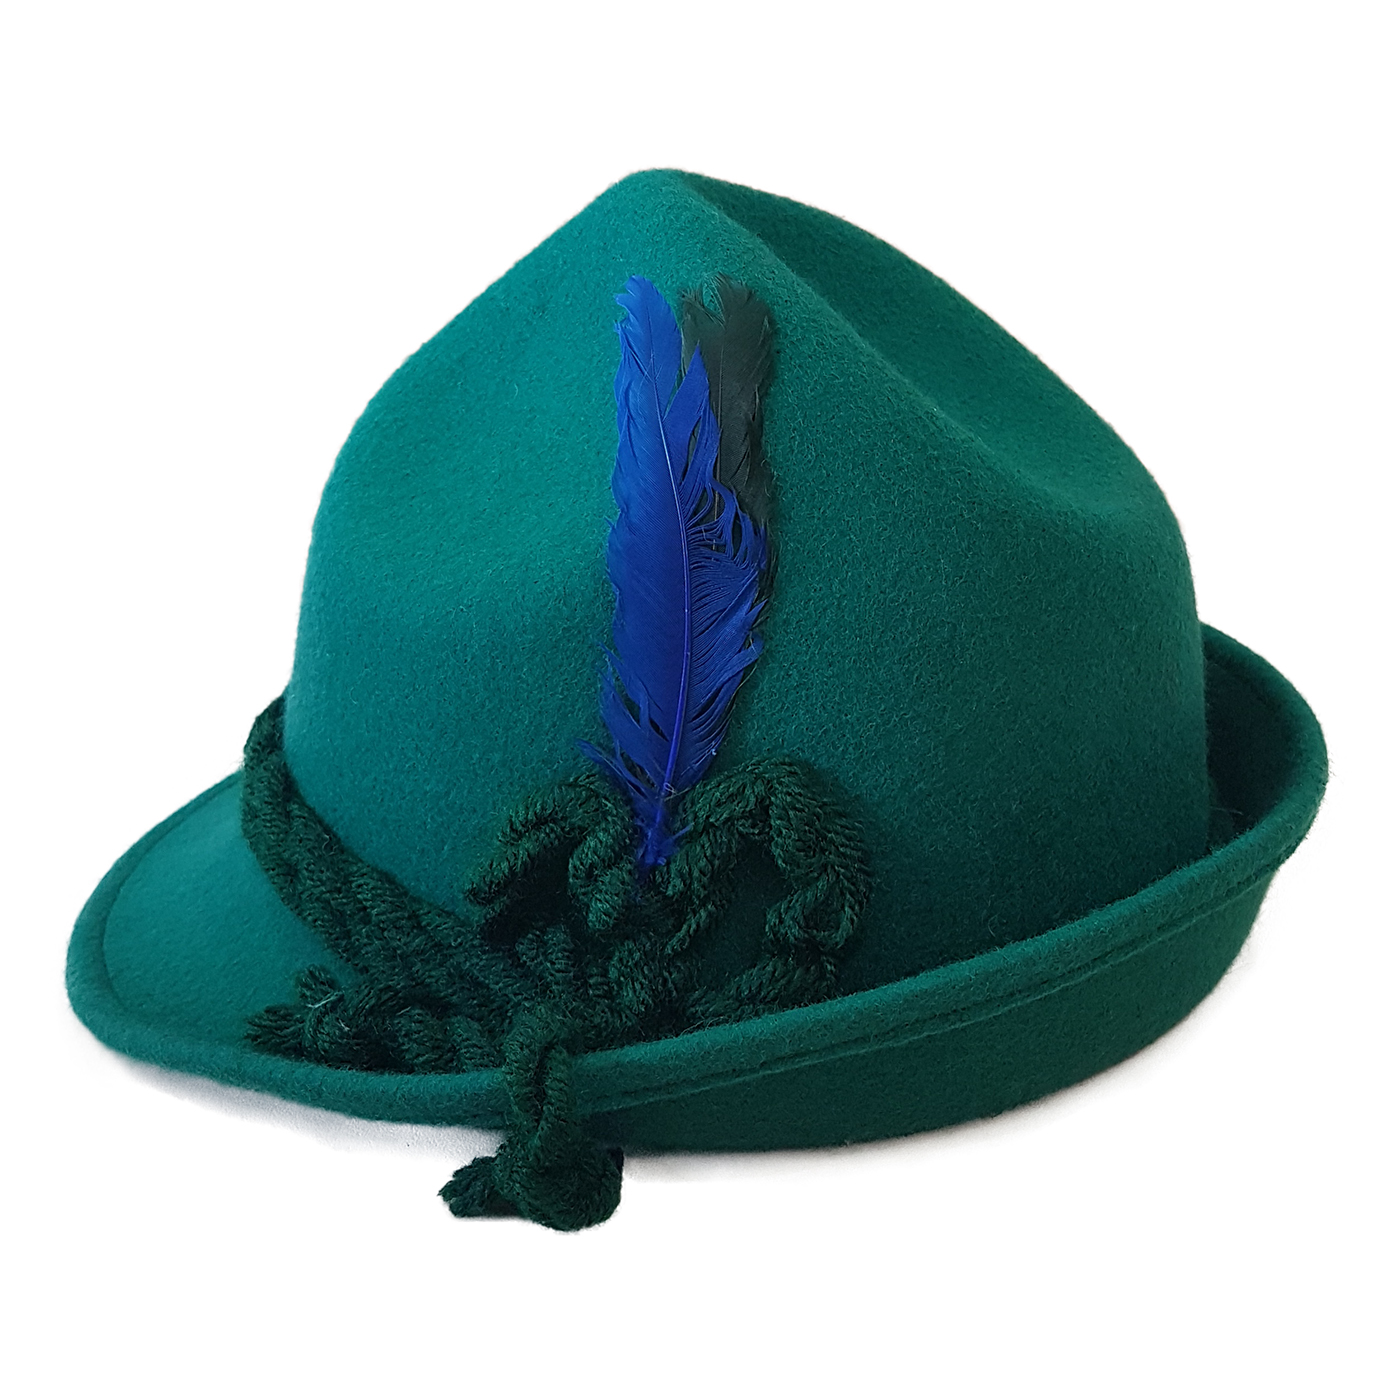 Chapéu Tirolês (chapéu típico alemão para oktober) c3da9024d1b